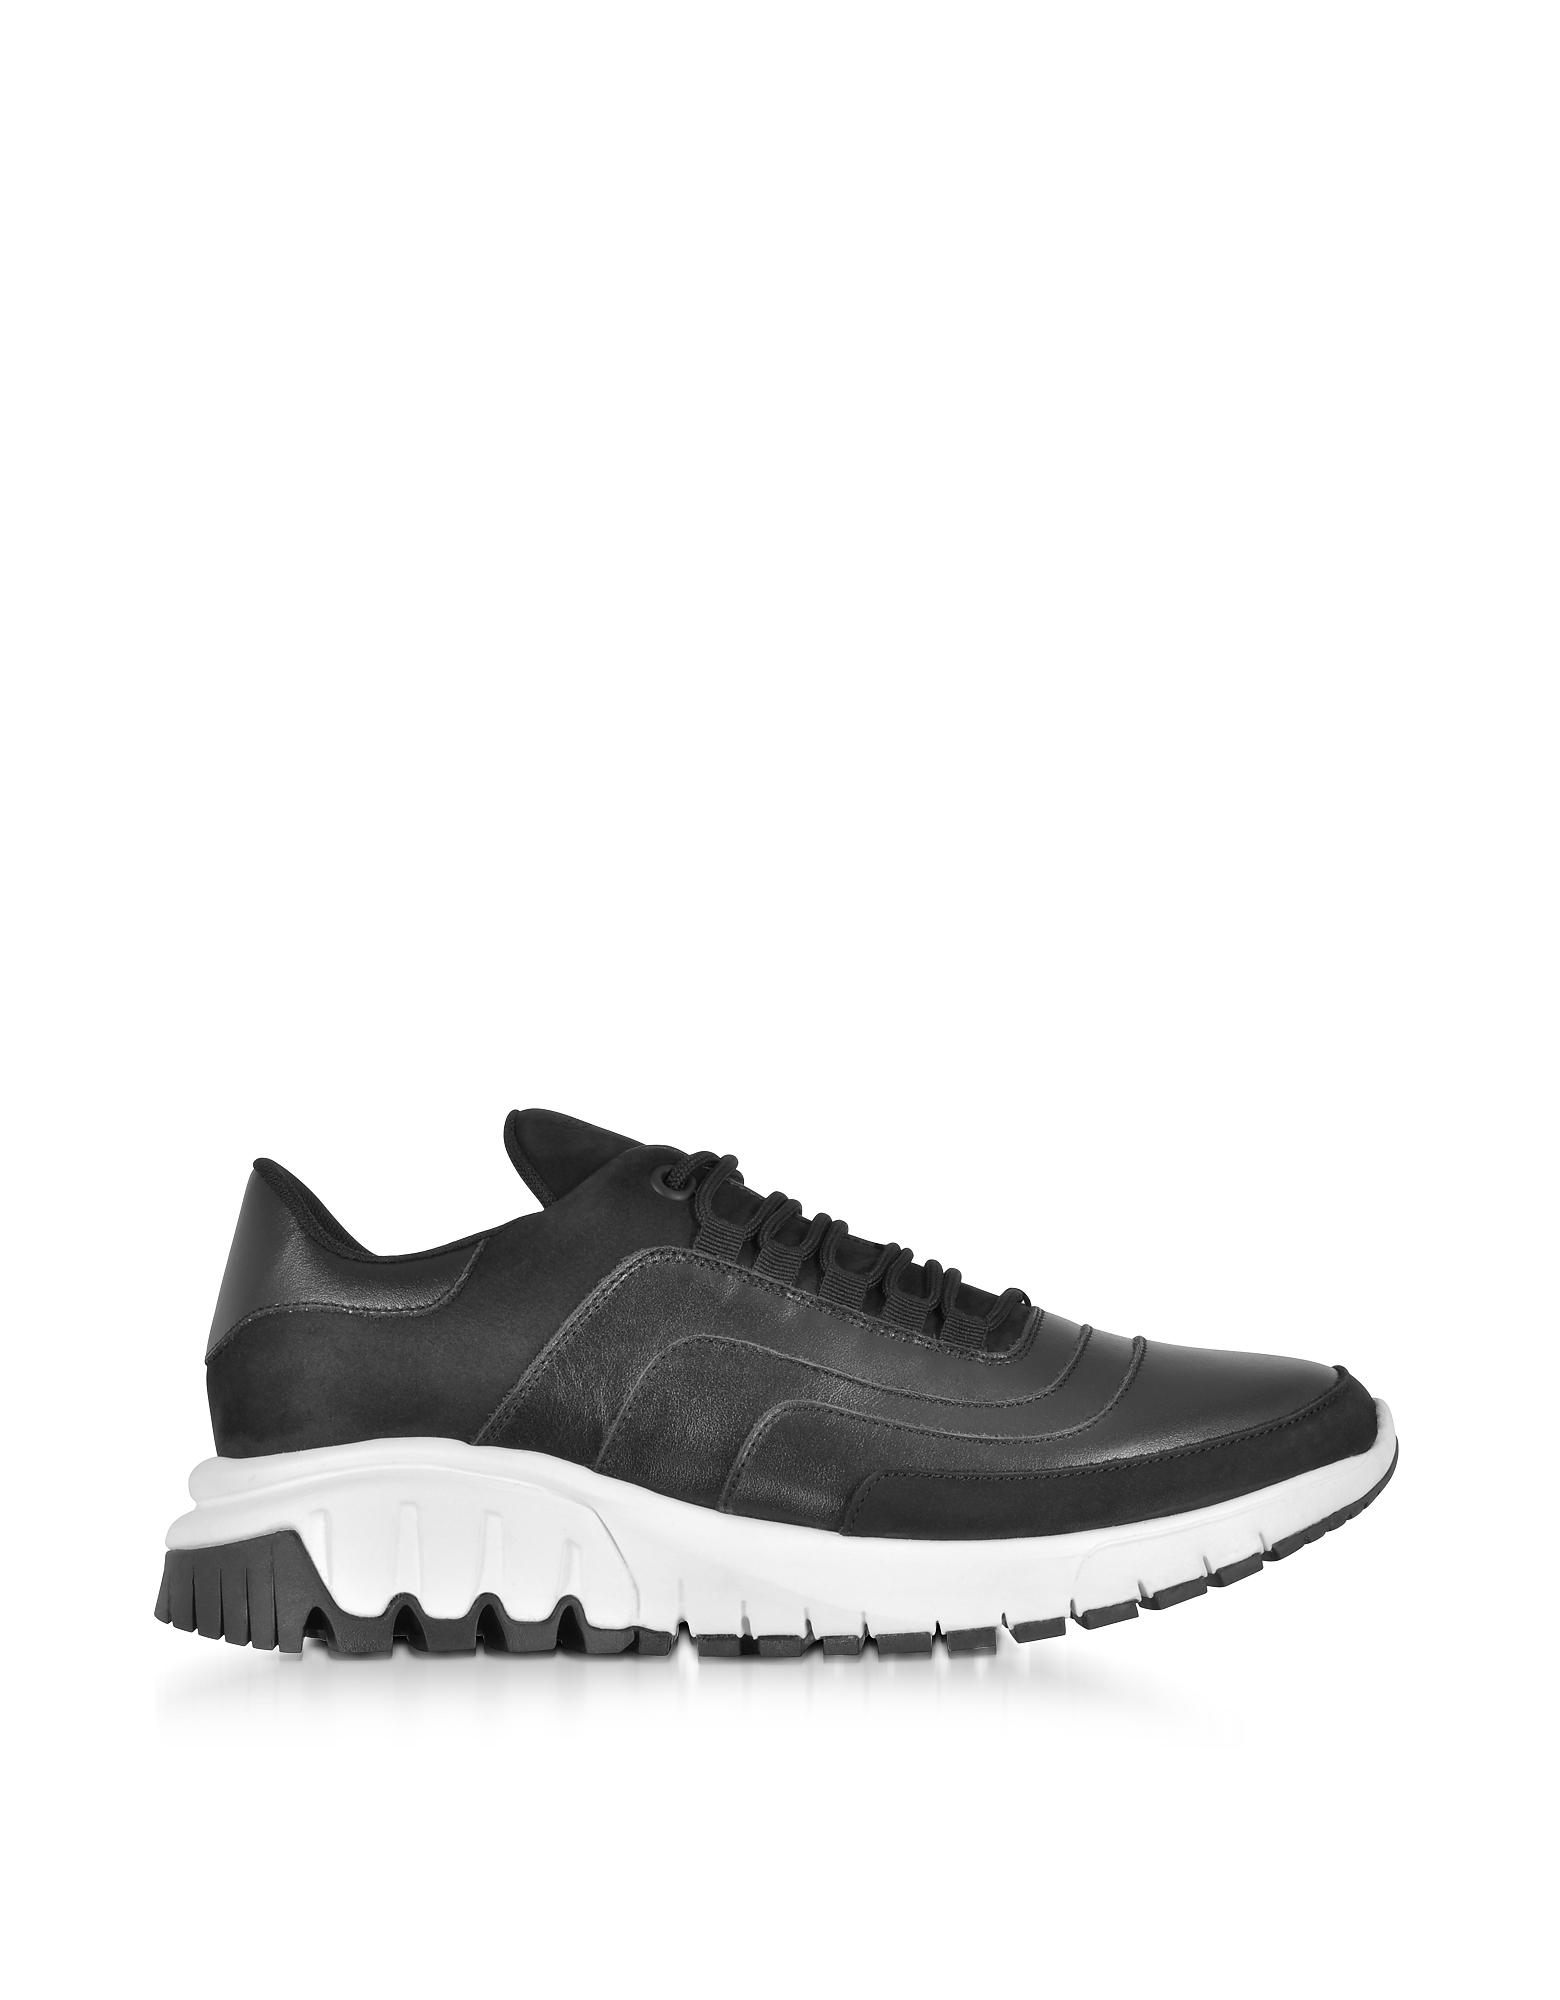 Neil Barrett Shoes, Black Leather and Nubuck Urban Runner